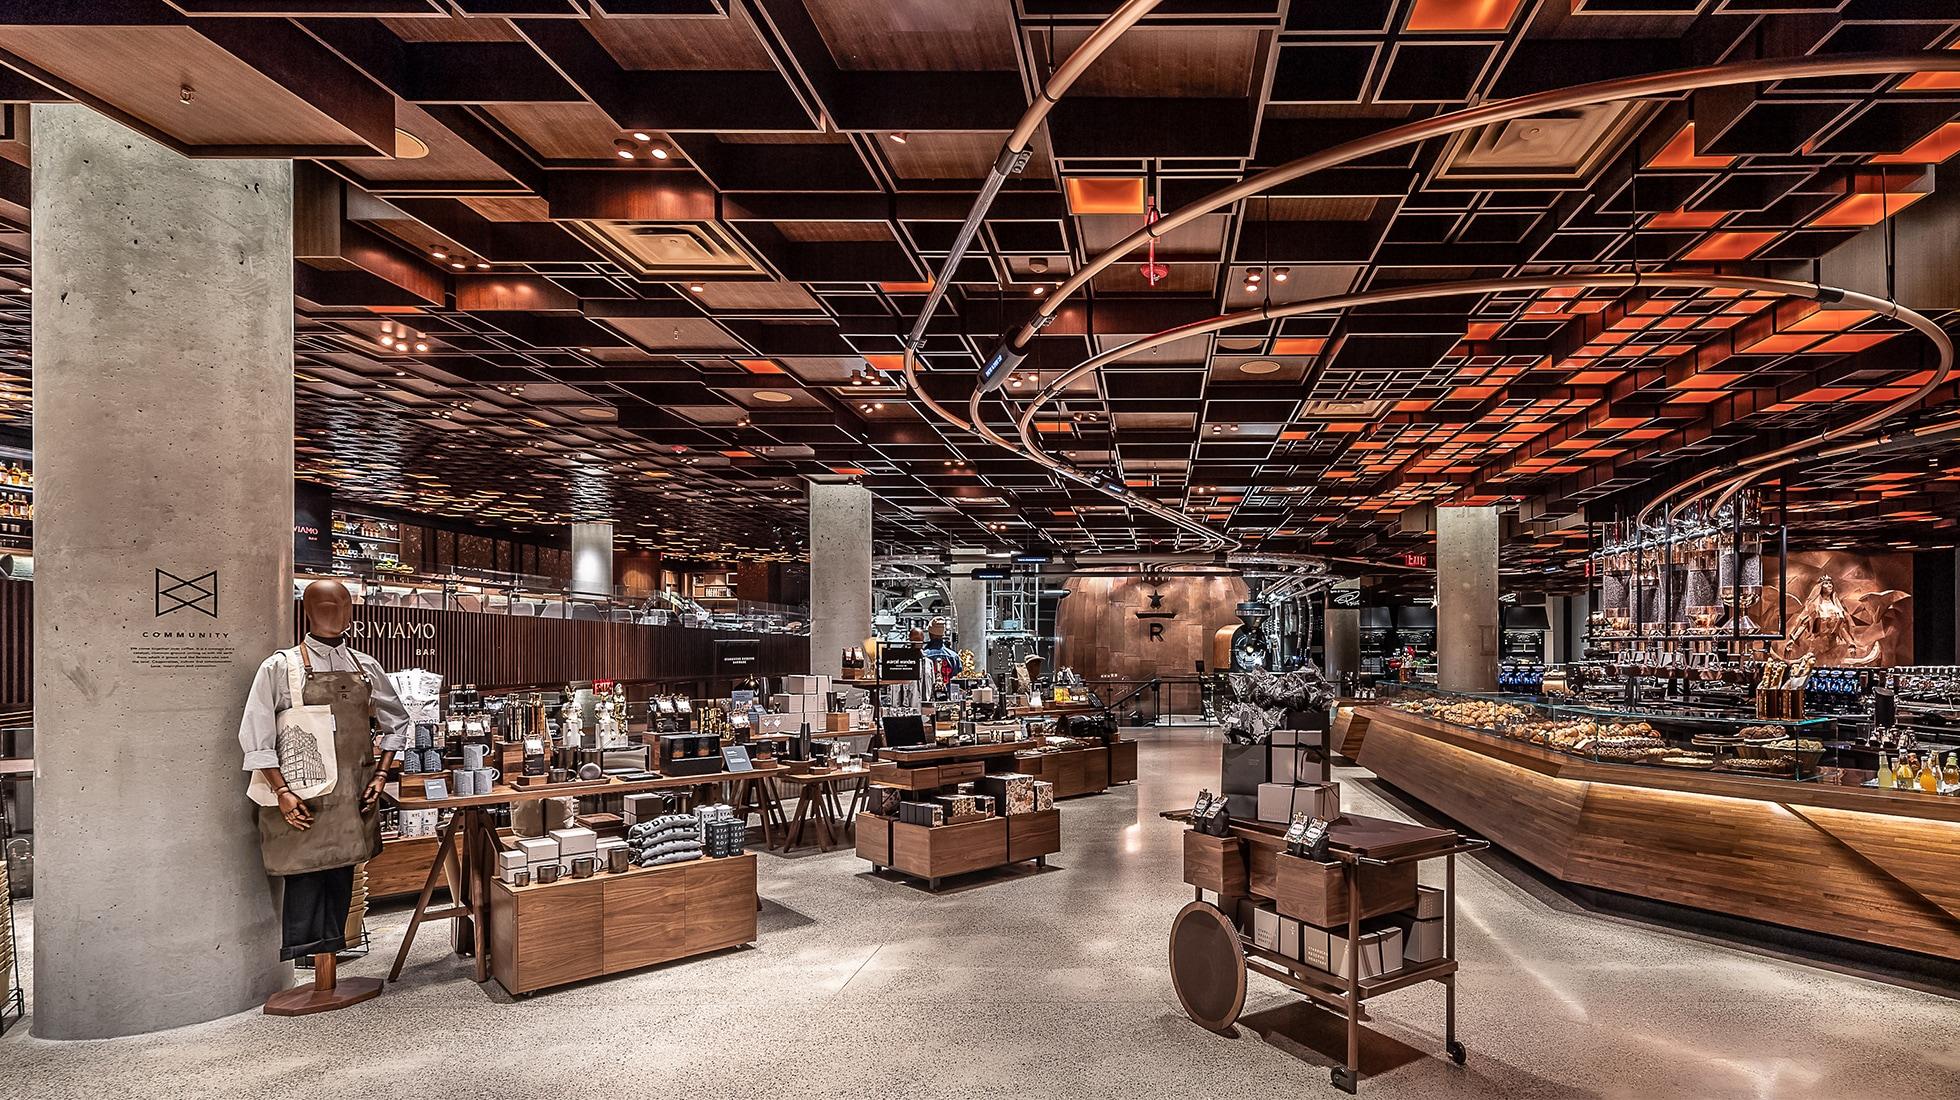 Interior of New York Roastery